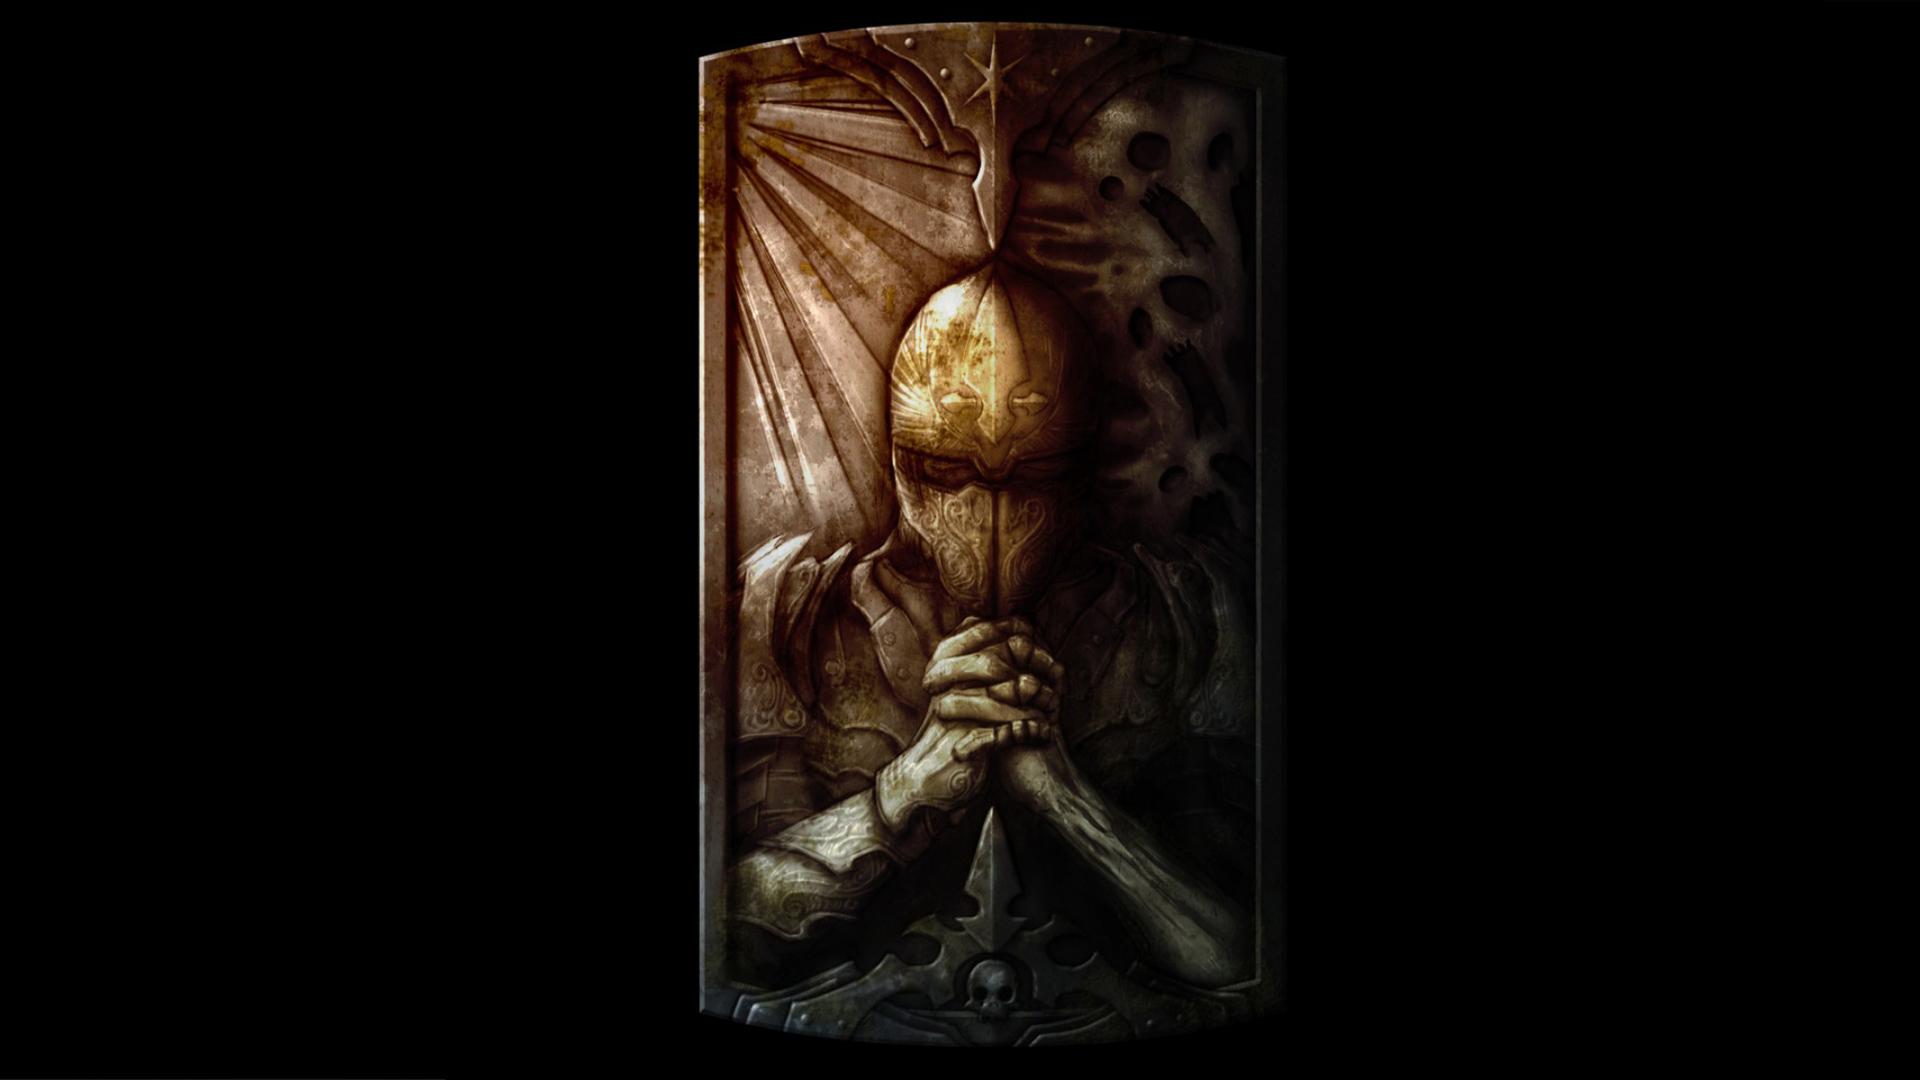 dark souls 2 II game hd wallpaper 1920x1080